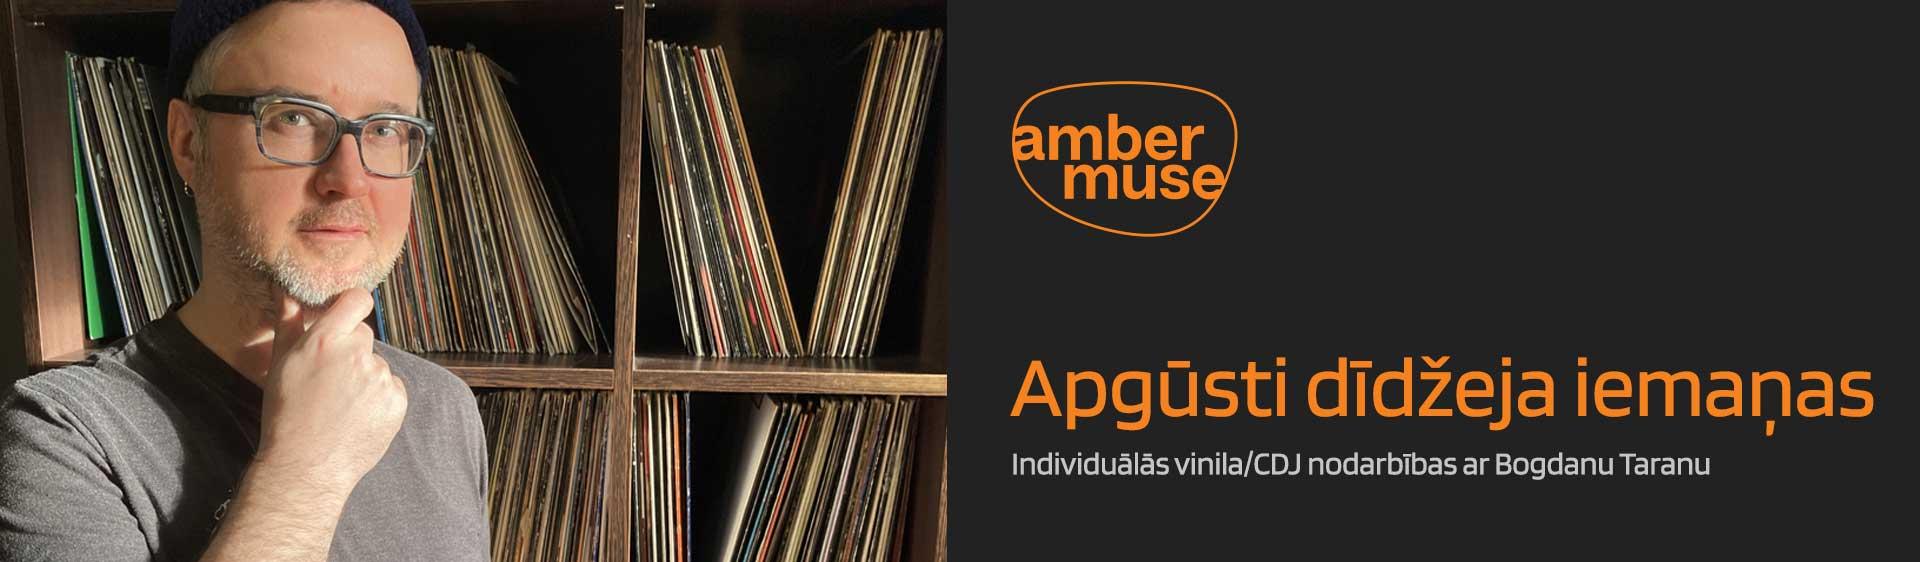 Amber Muse dj Class Header LV